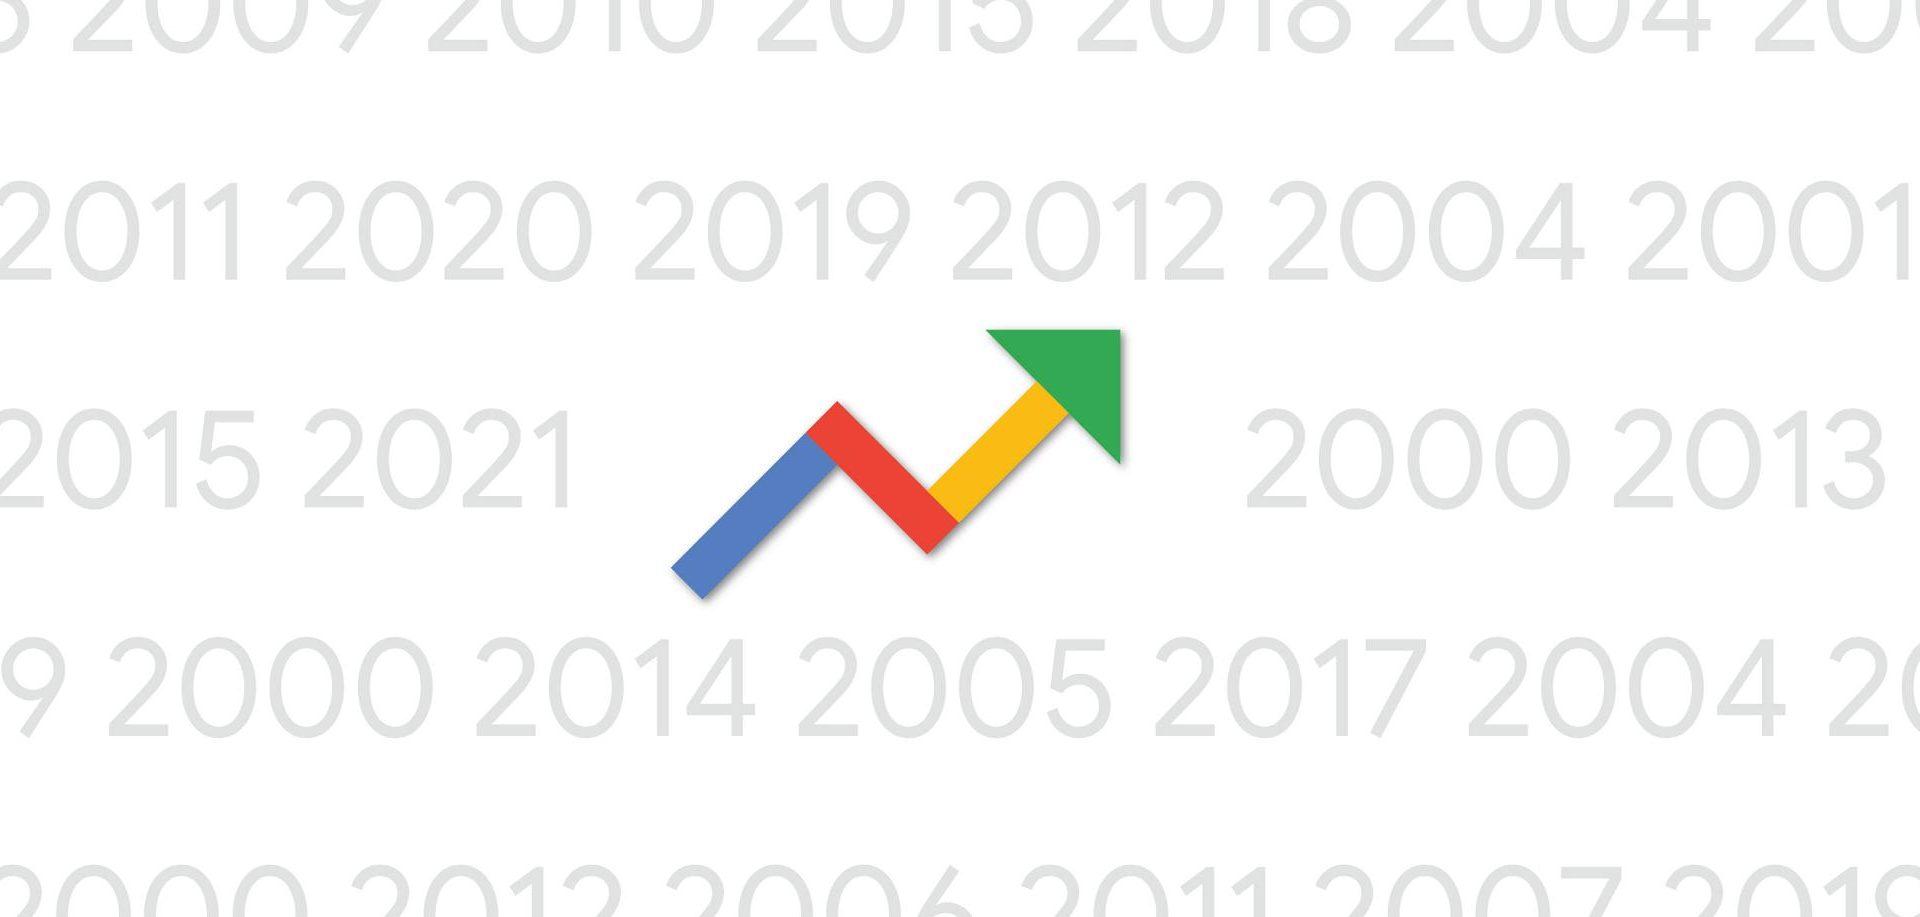 Google Cloud | Google Trends